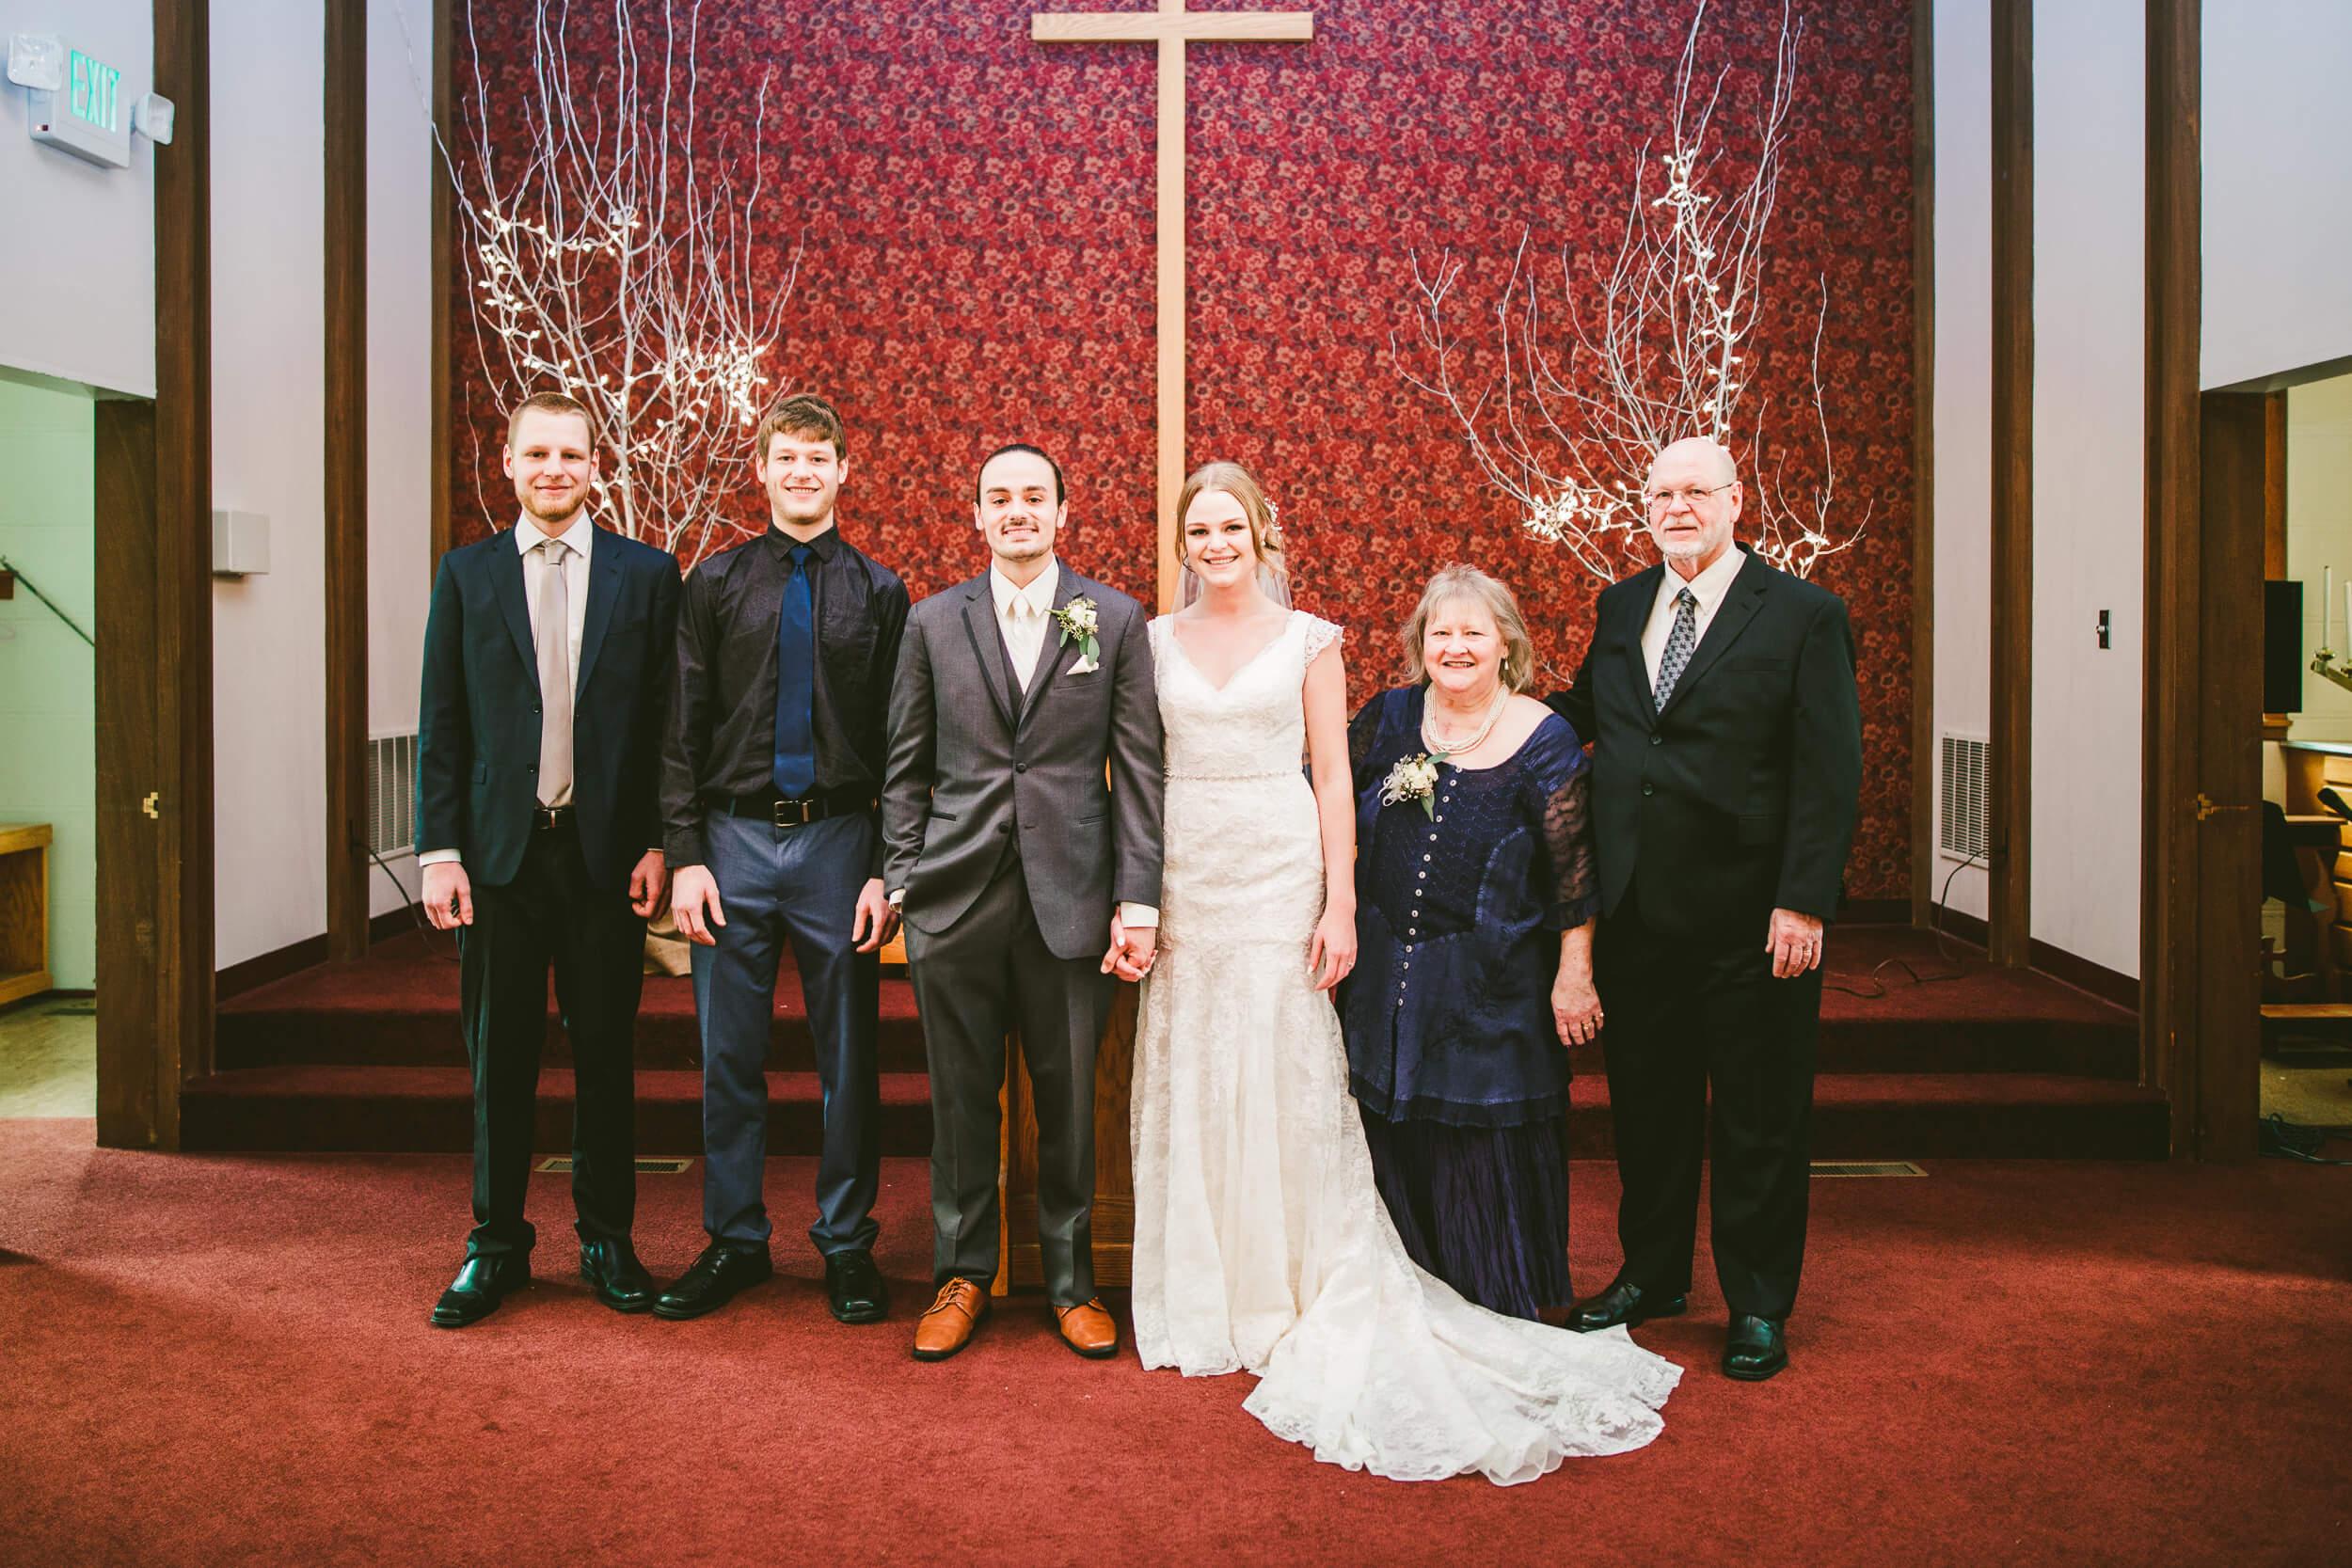 mukogawa winter wedding in spokane (180).jpg